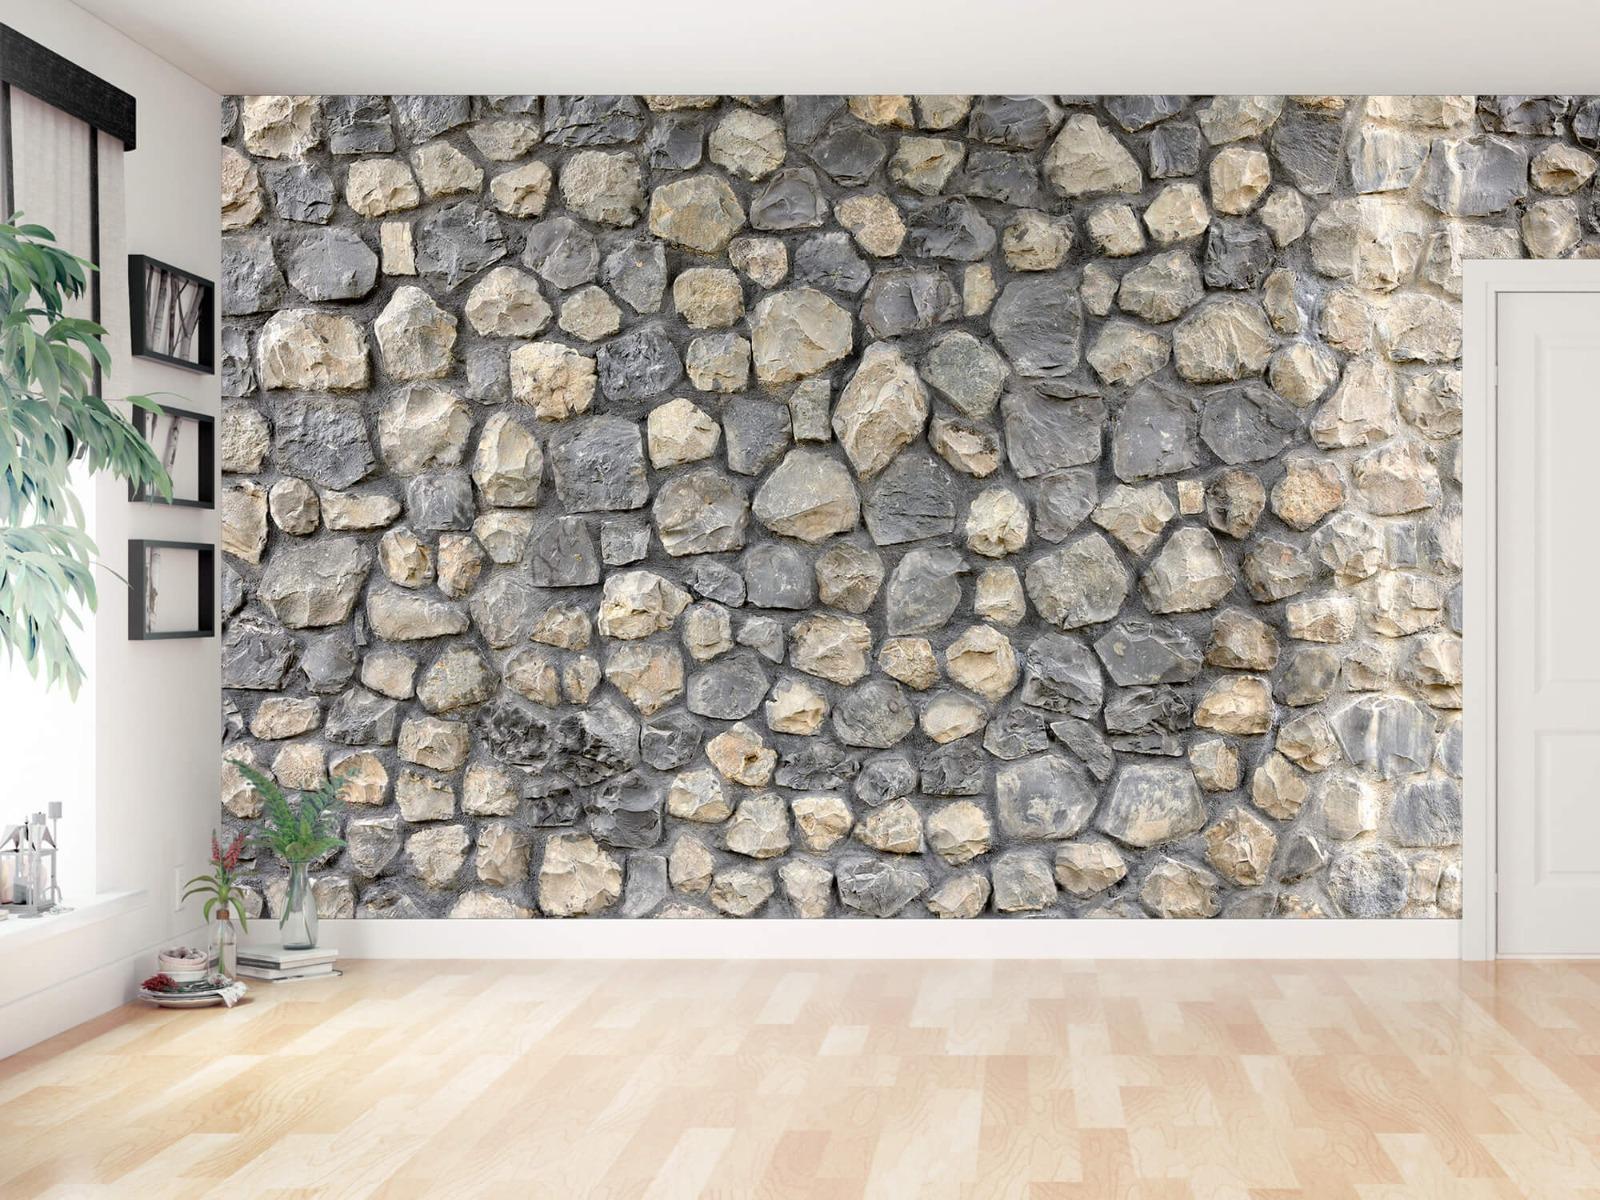 Steen behang - Breukstenen - Wallexclusive - Ontvangstruimte 14